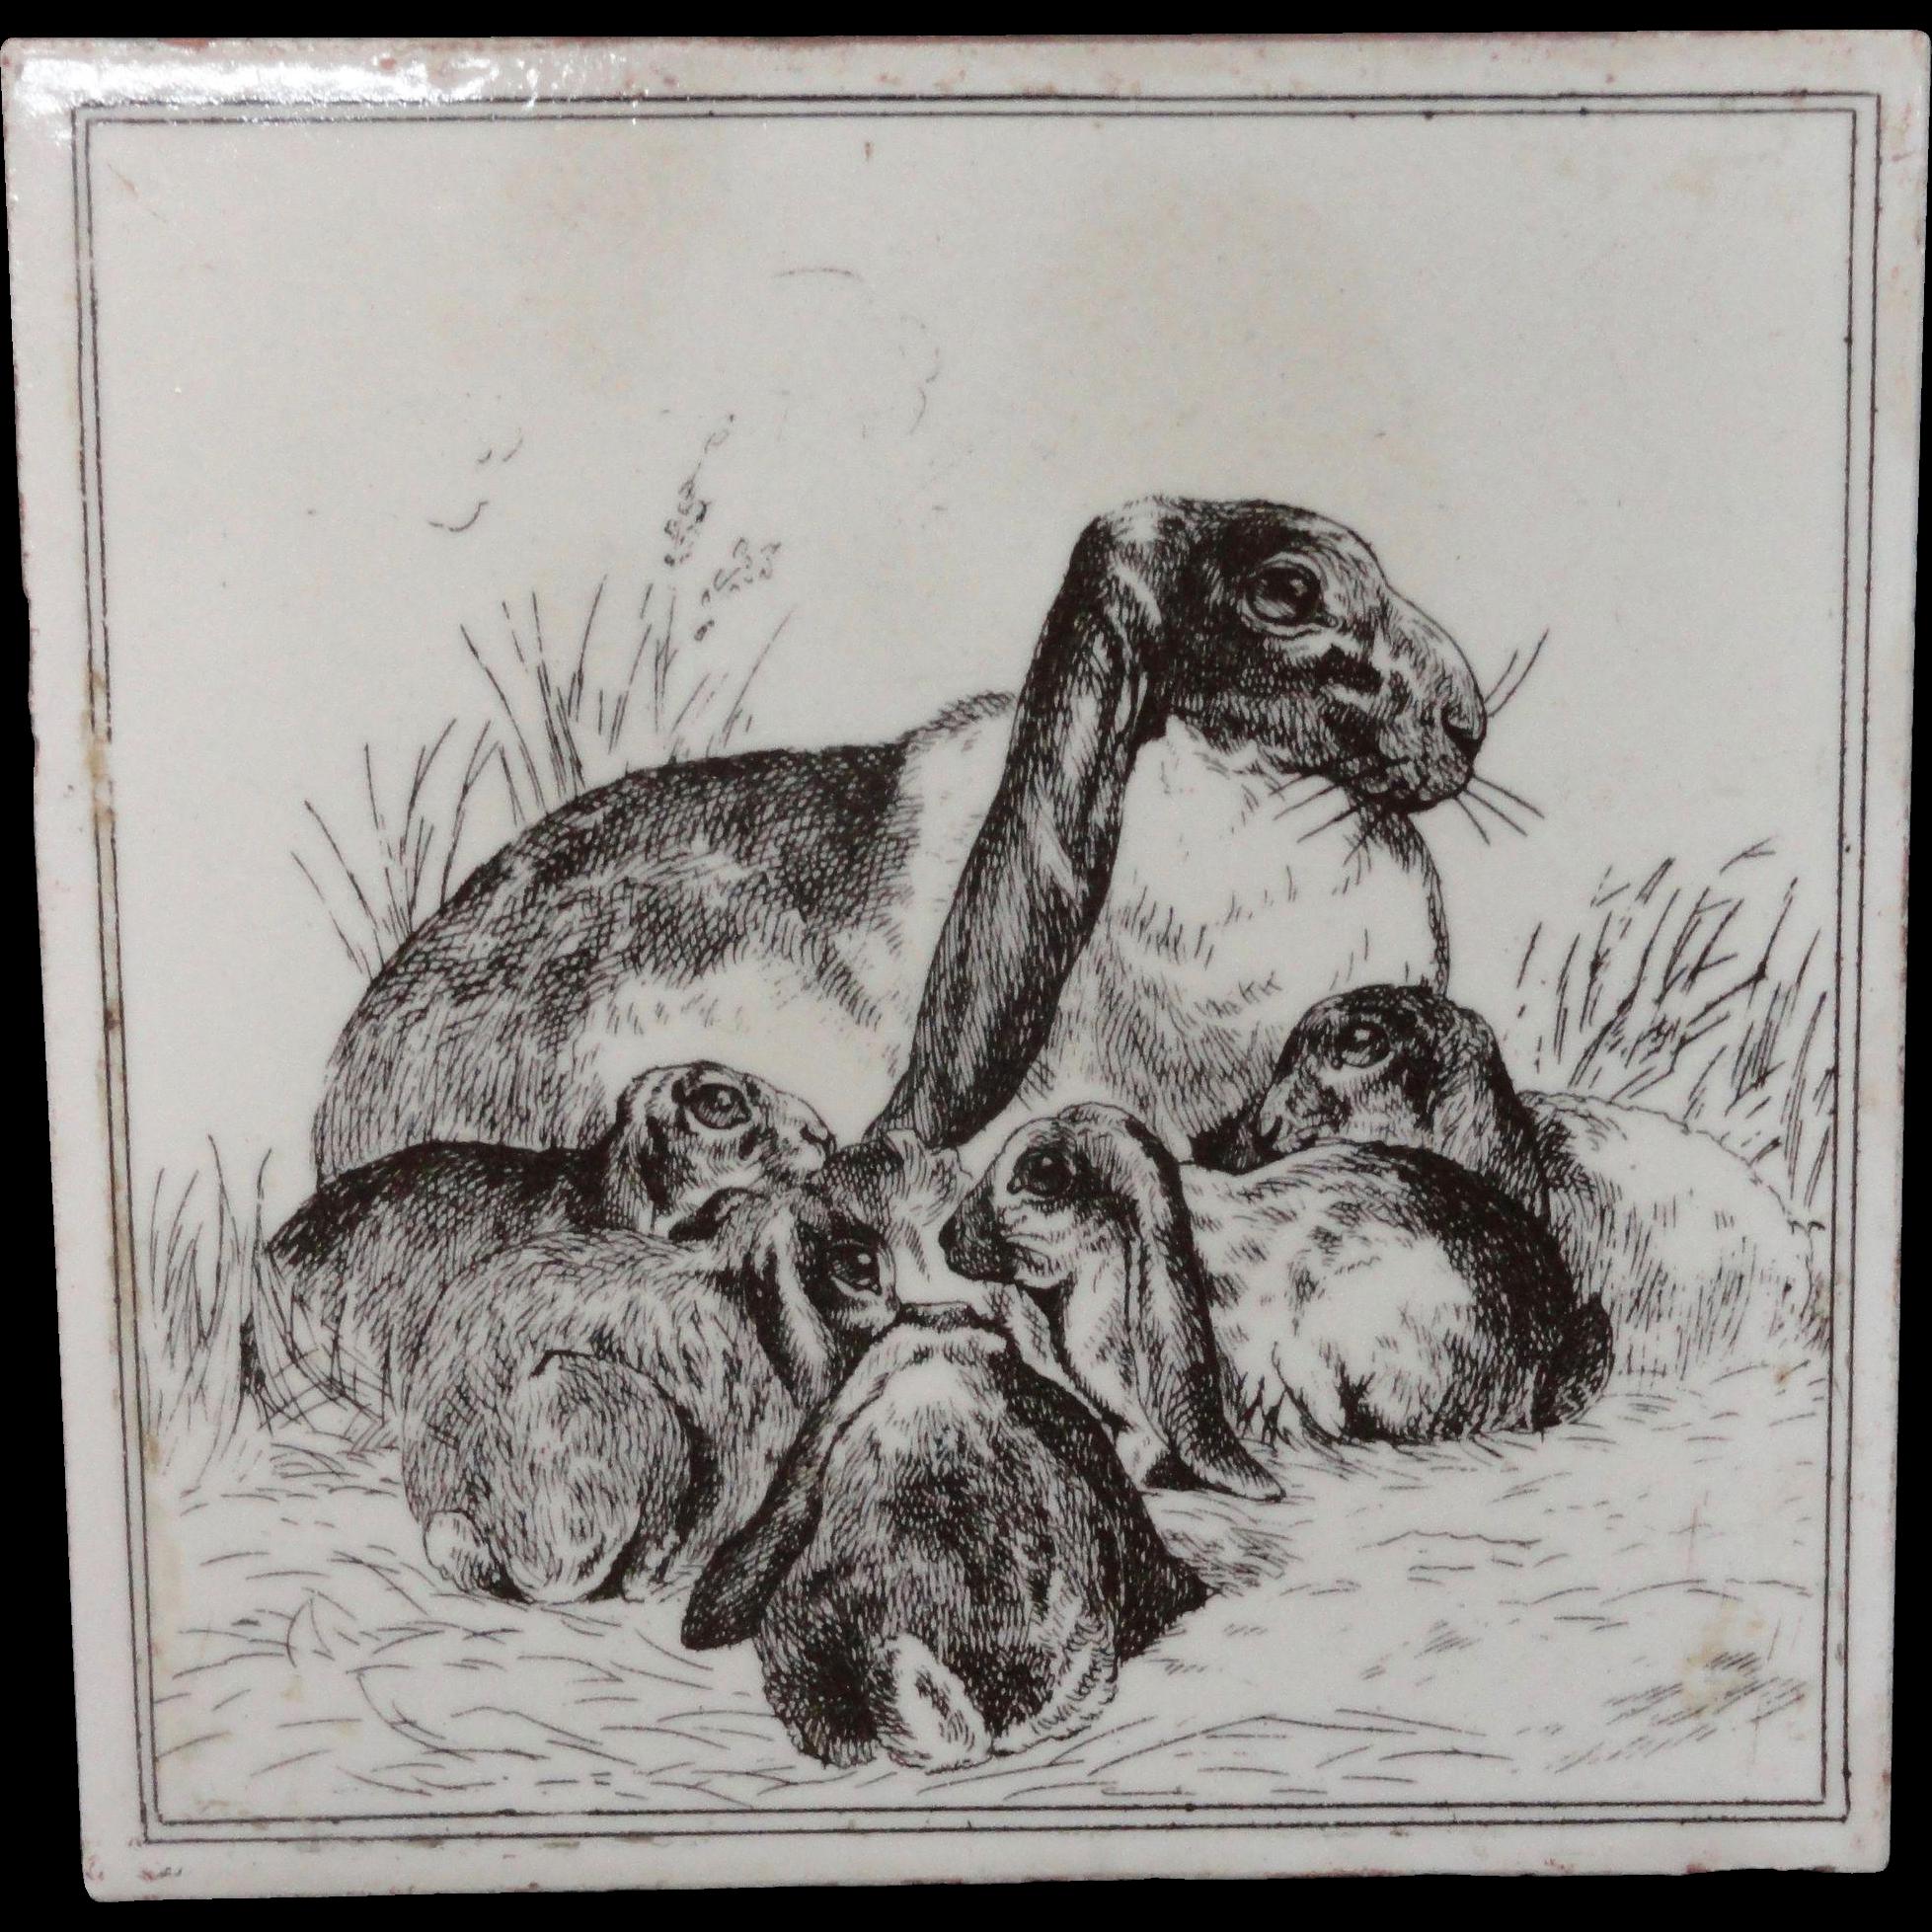 Brown Transferware Tile Victorian ~ Rabbits 1885